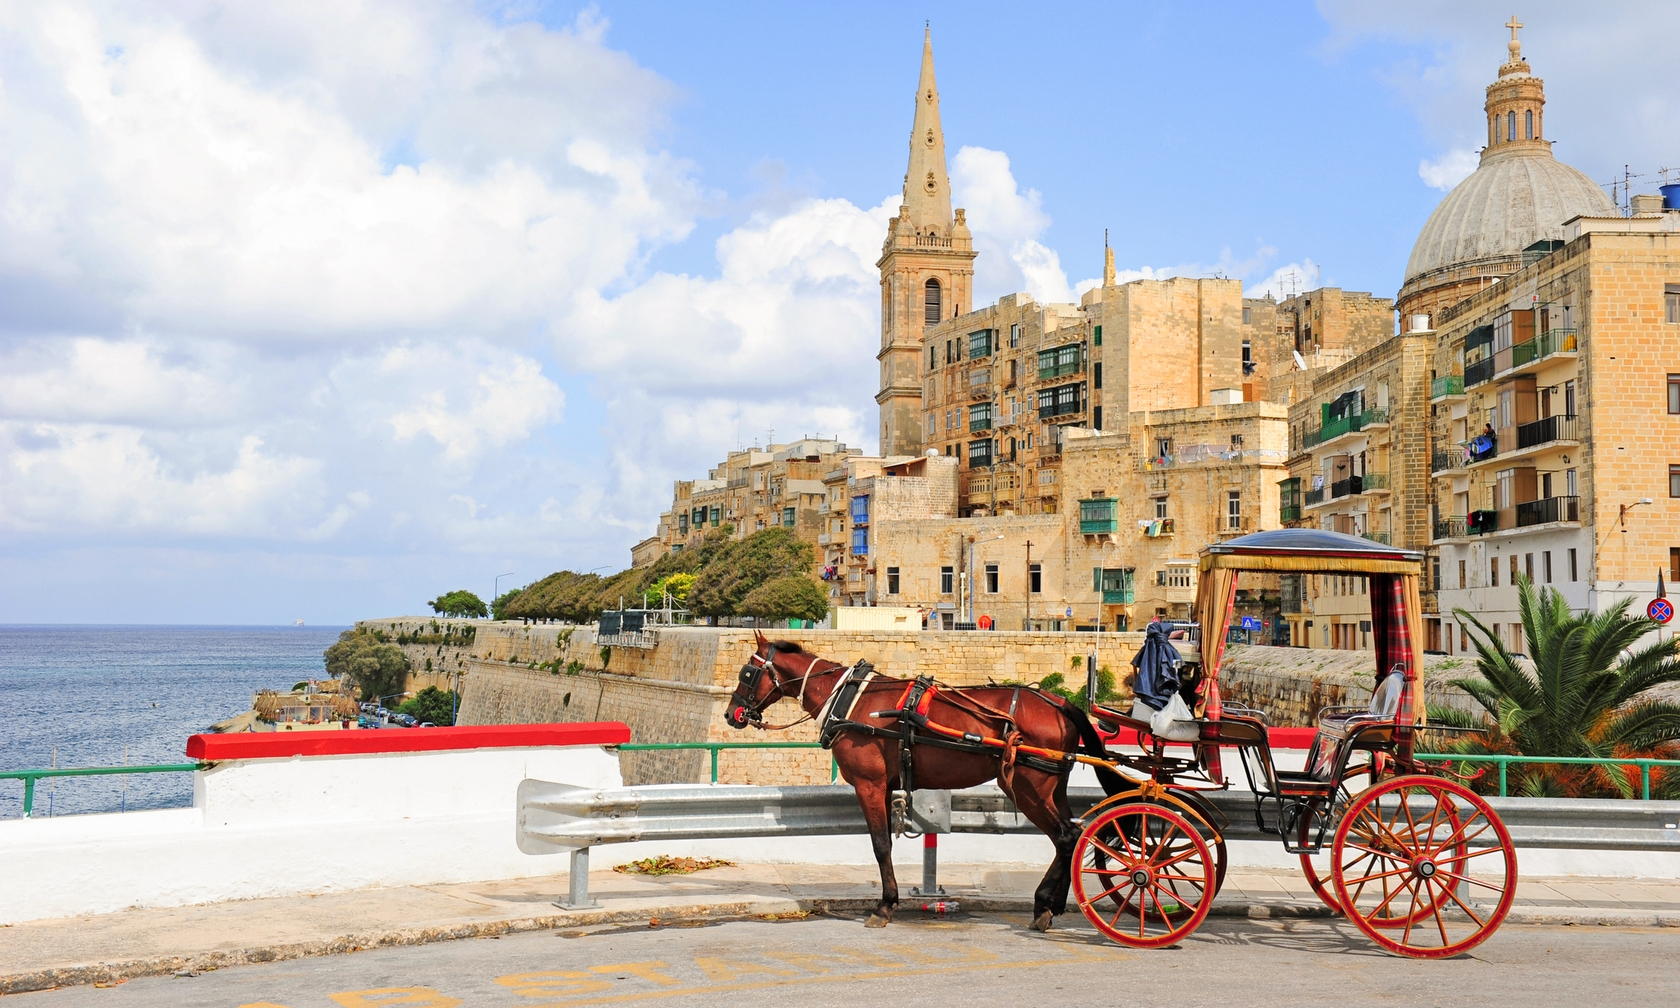 Holiday rentals in Malta